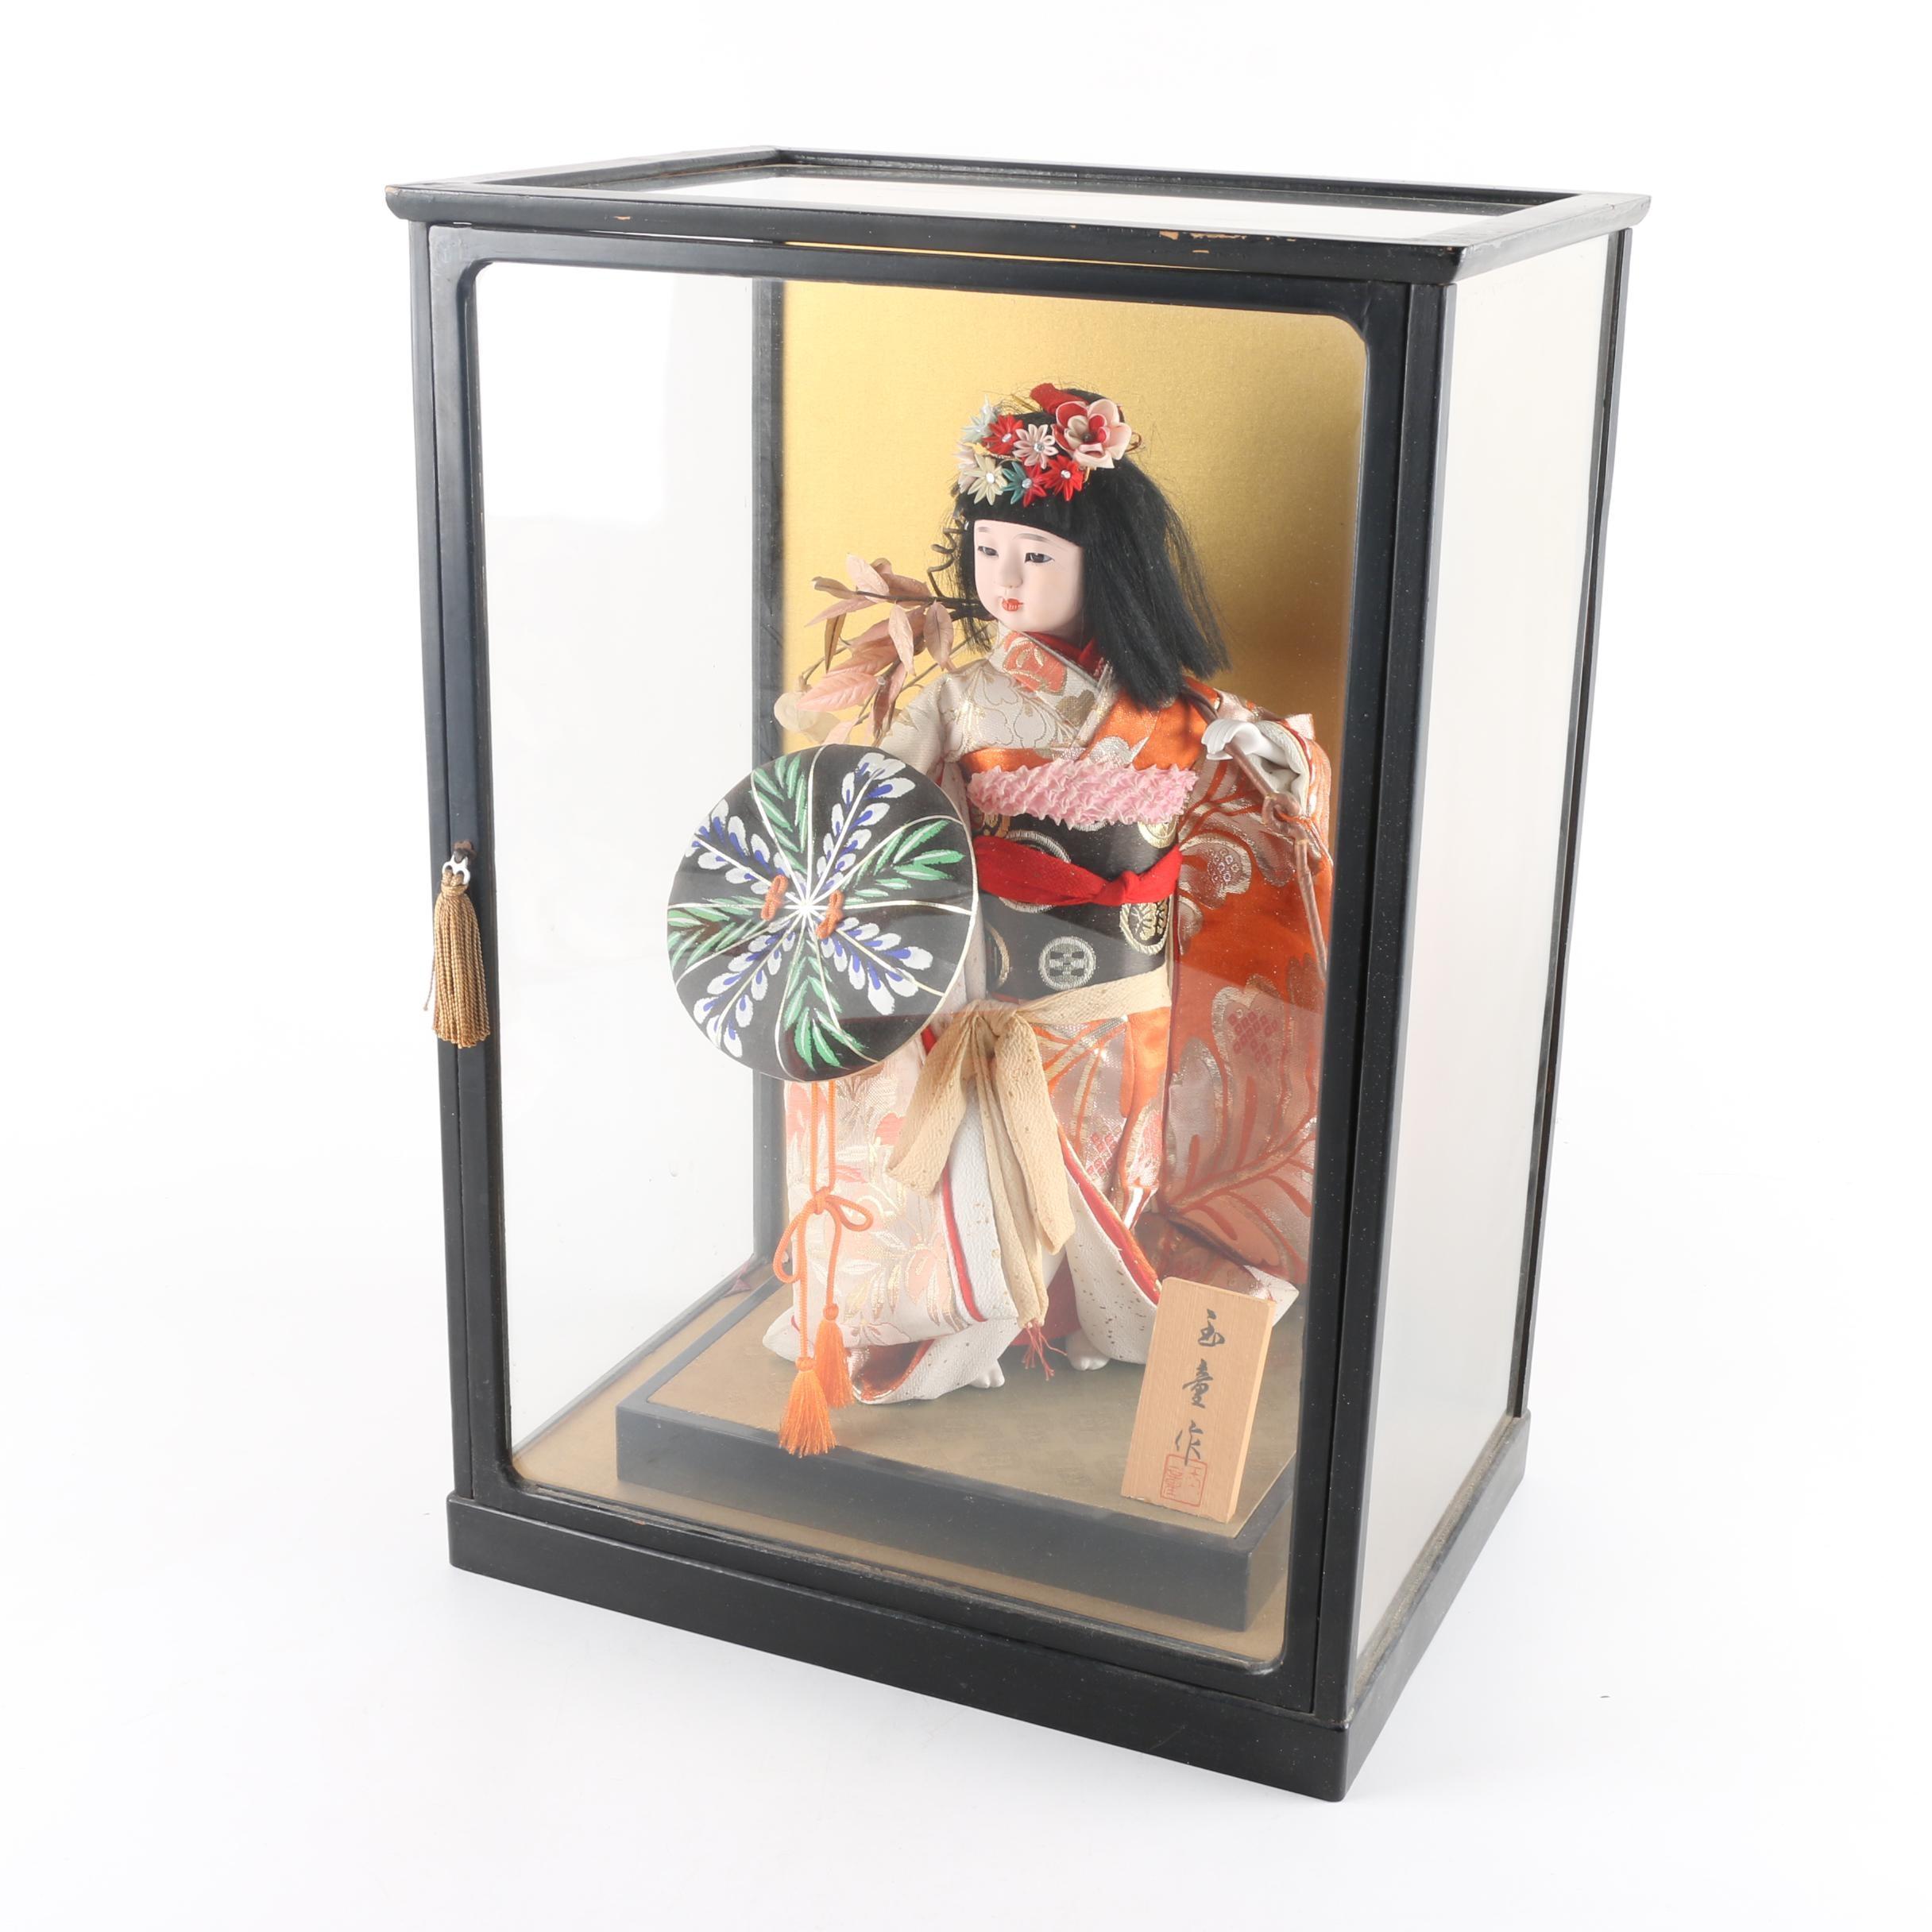 Ceramic Japanese Doll with Display Box